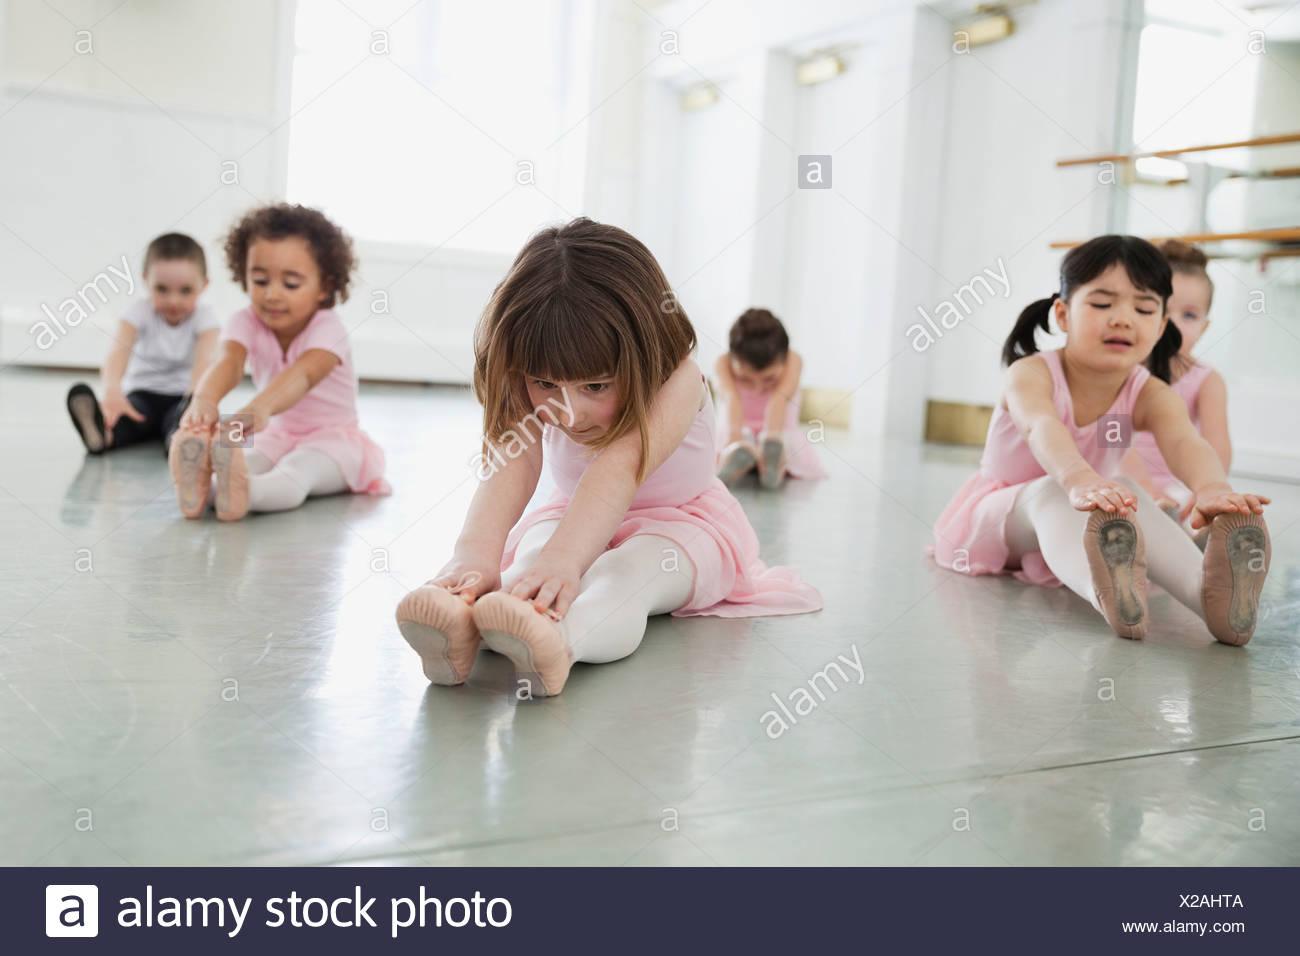 Children doing stretching exercises in ballet studio - Stock Image